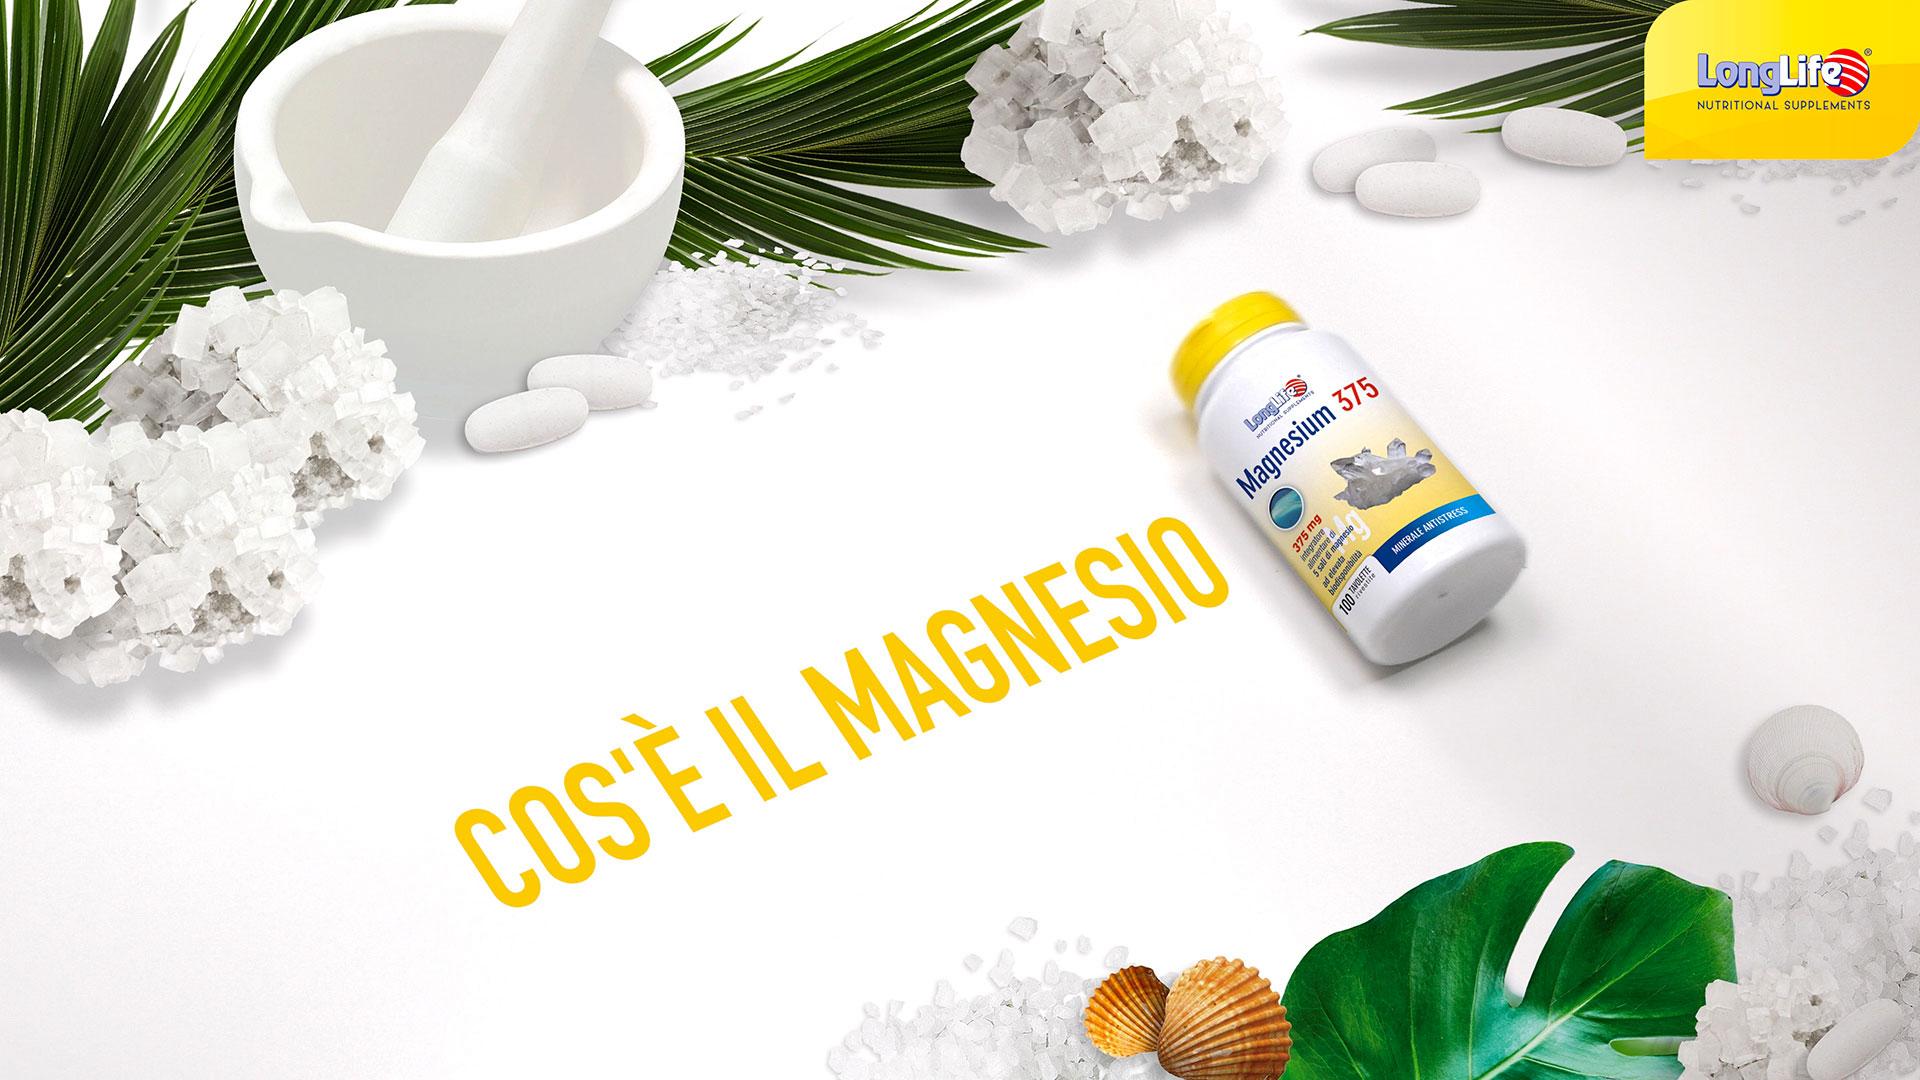 Video pillole: Magnesium 375 LongLife